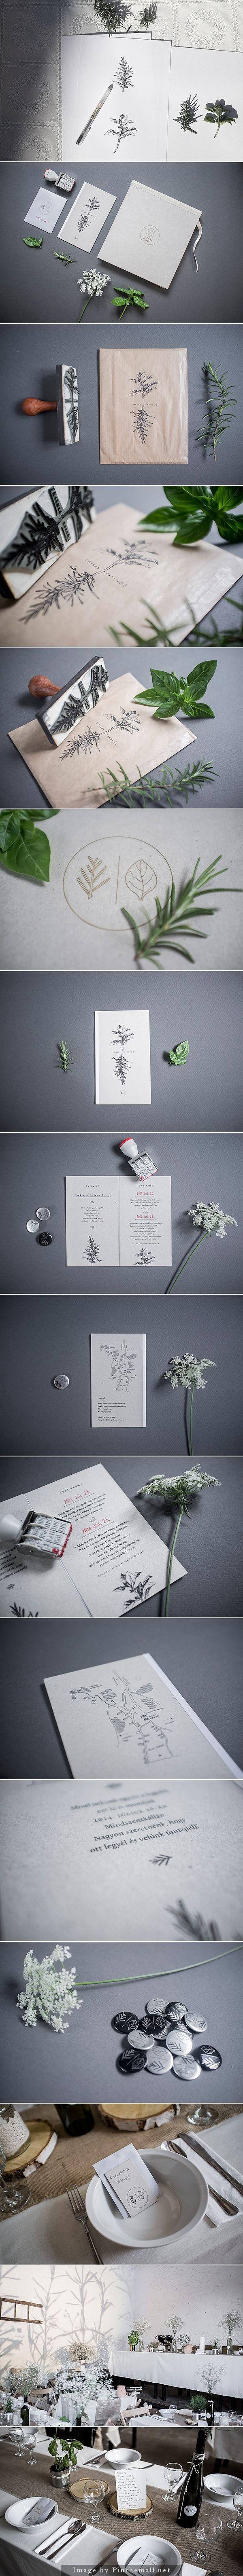 Zsofis wedding by Eszter Laki